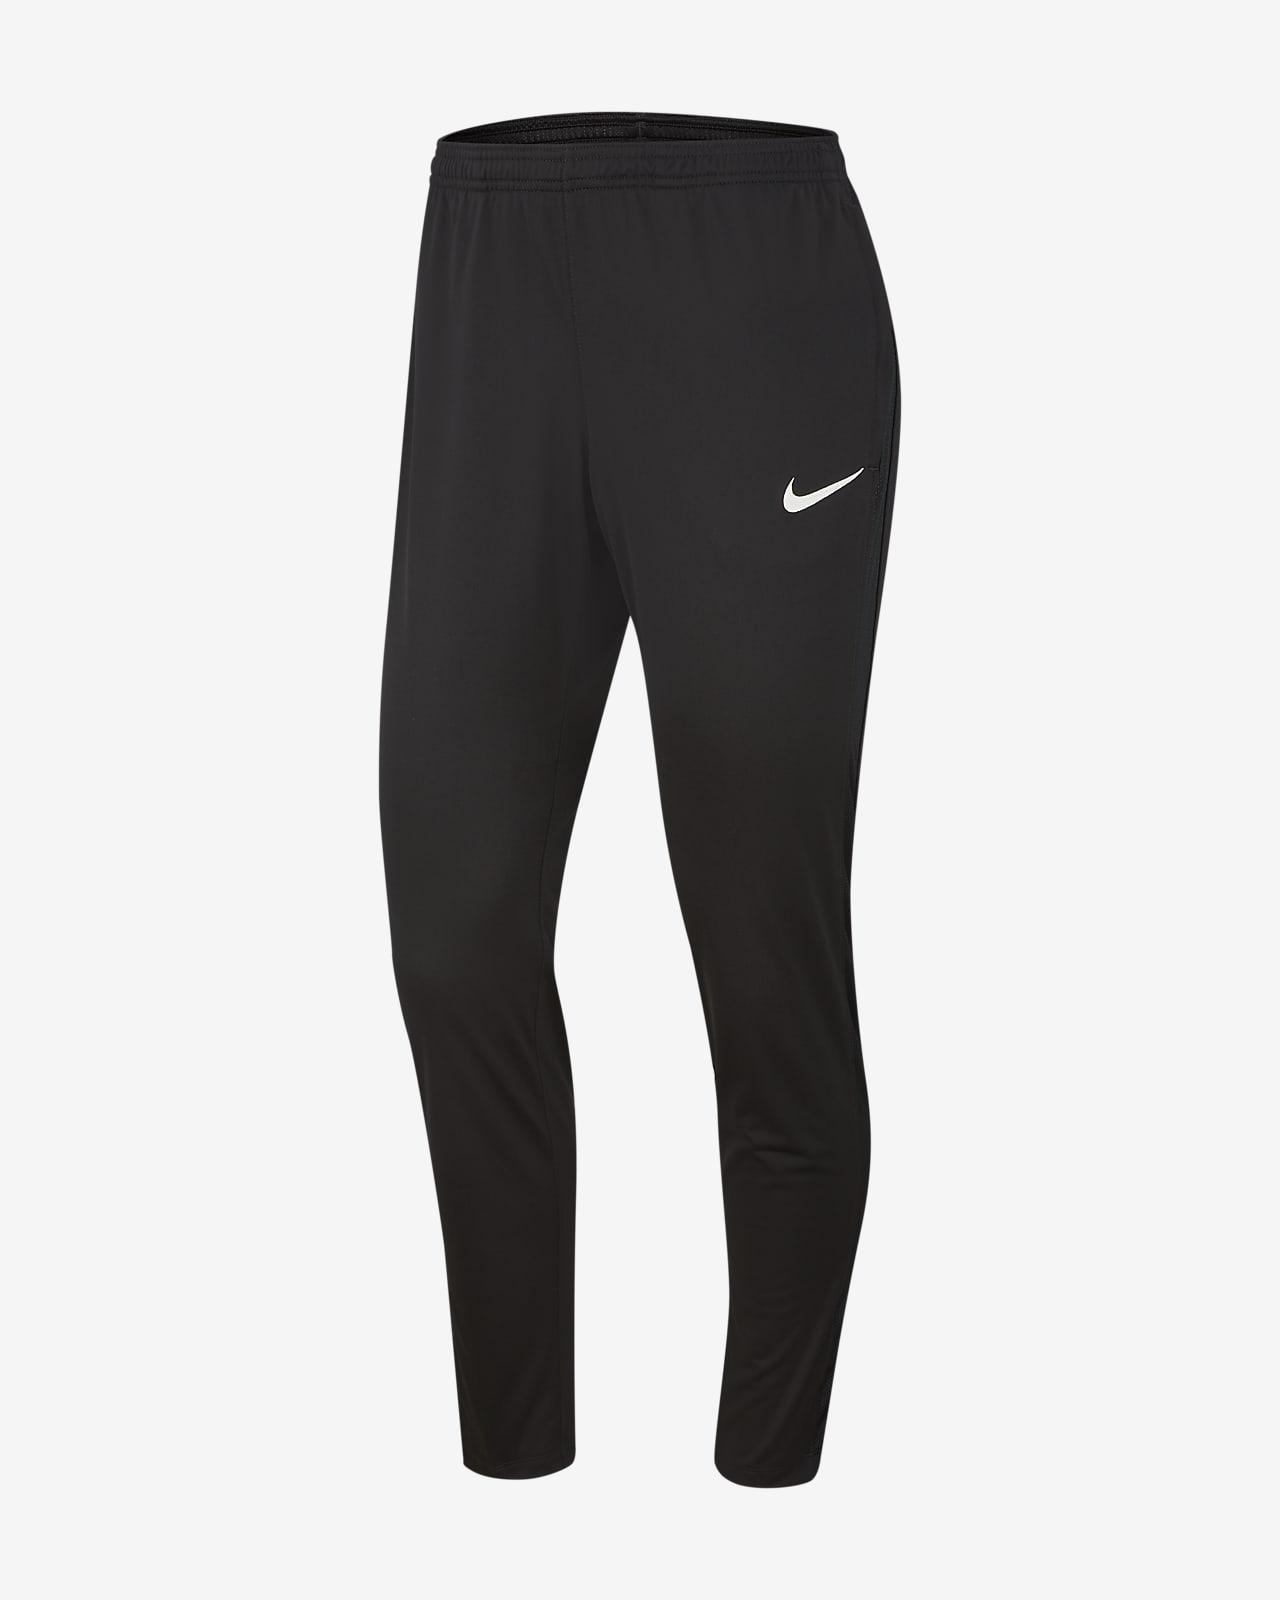 Nike Dri-FIT Academy 18 Women's Football Pants